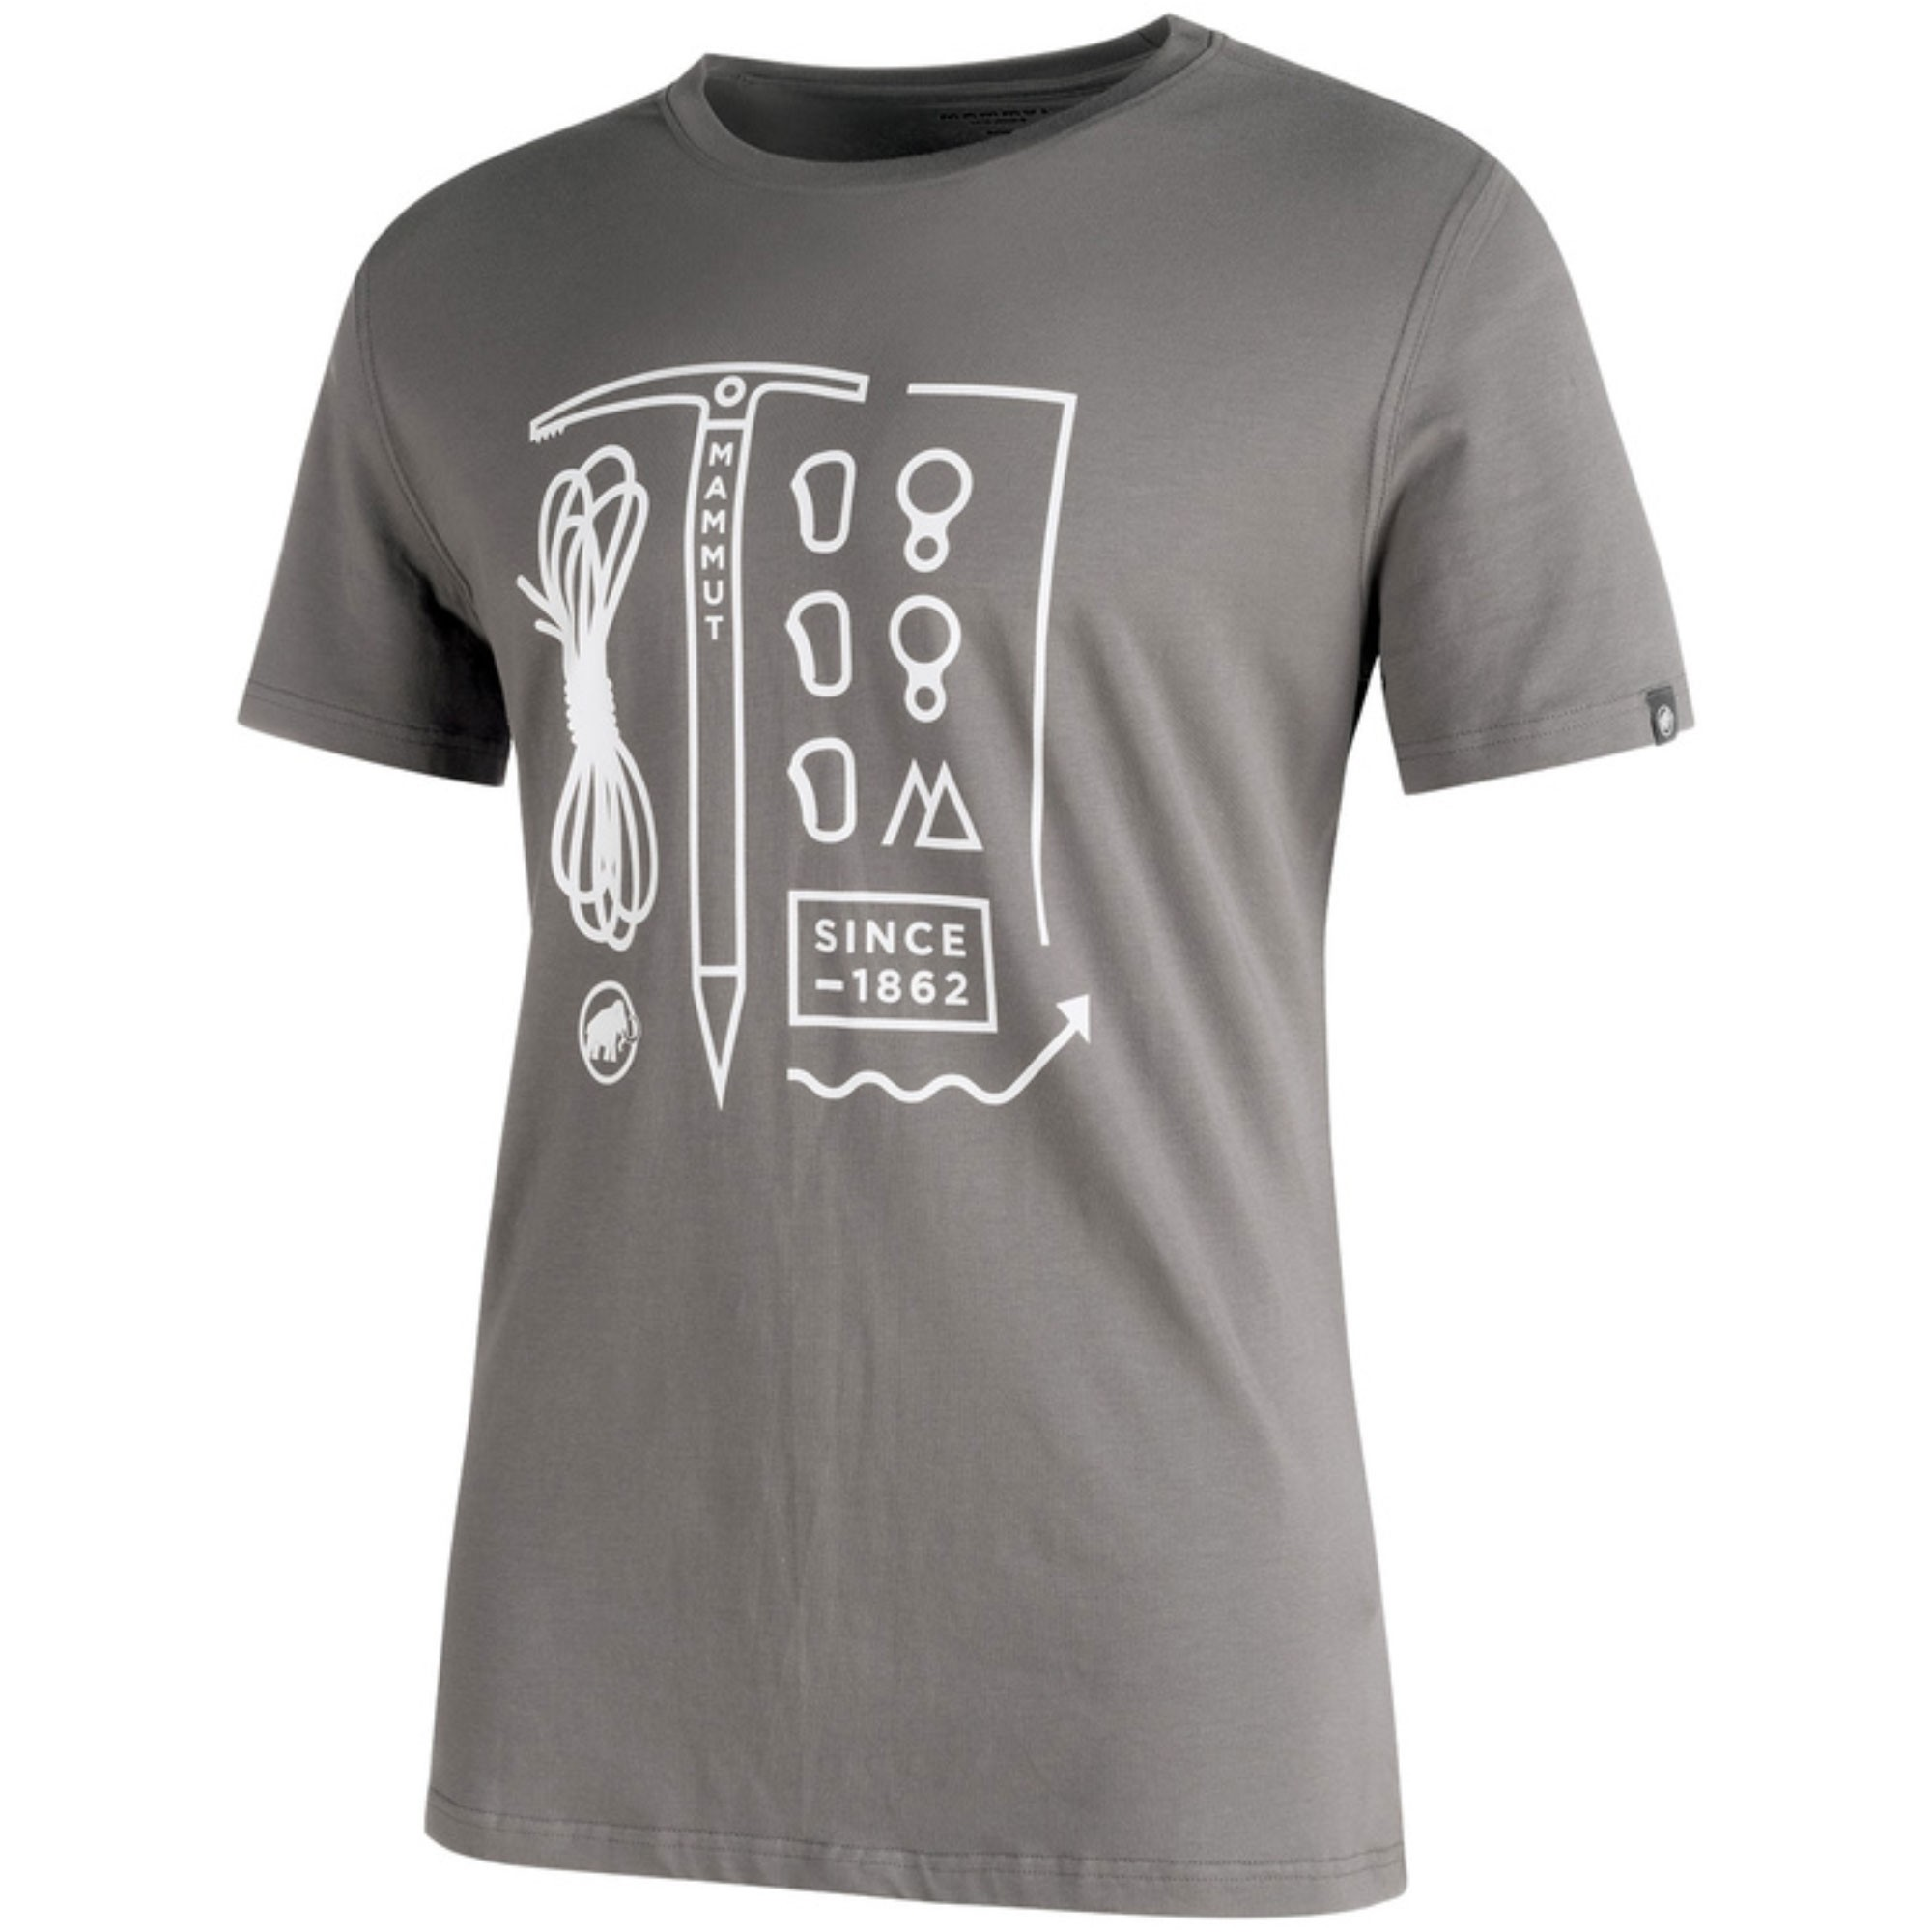 Mammut Sloper T-Shirt - Titanium